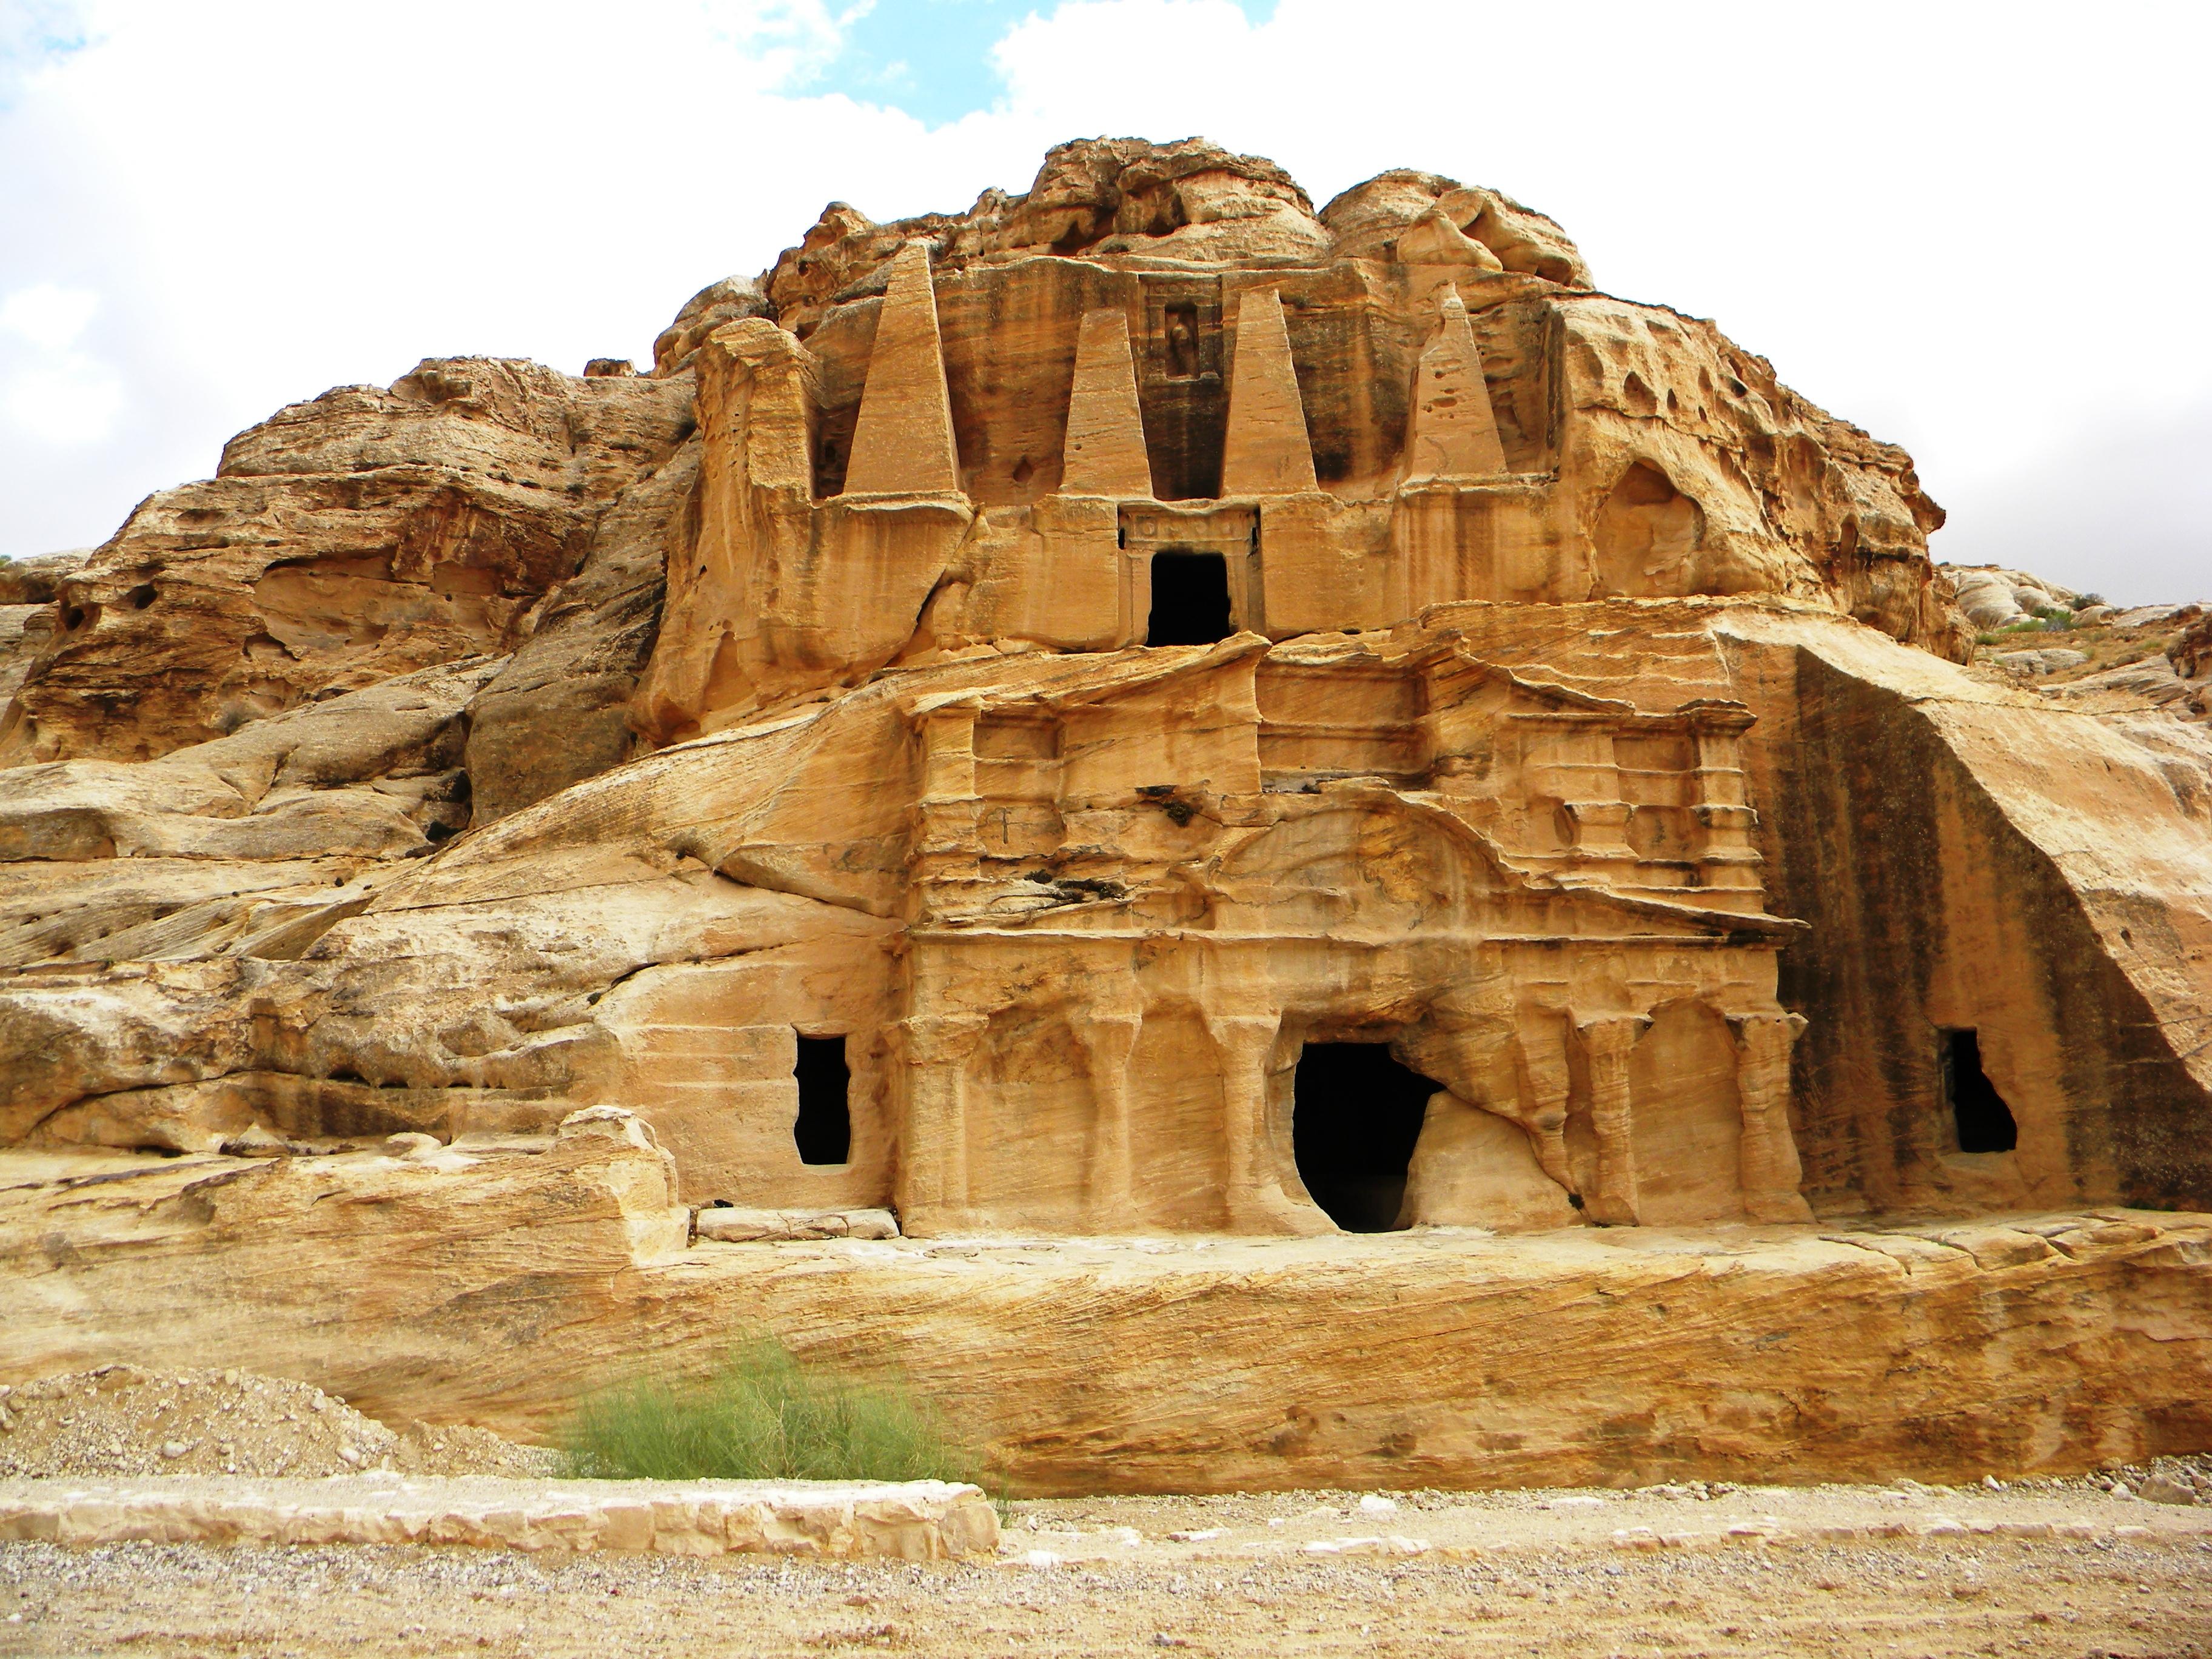 File:Jordan, Petra. The Obelisk Tomb and the Bab es-Siq Triclinium.jpg -  Wikimedia Commons